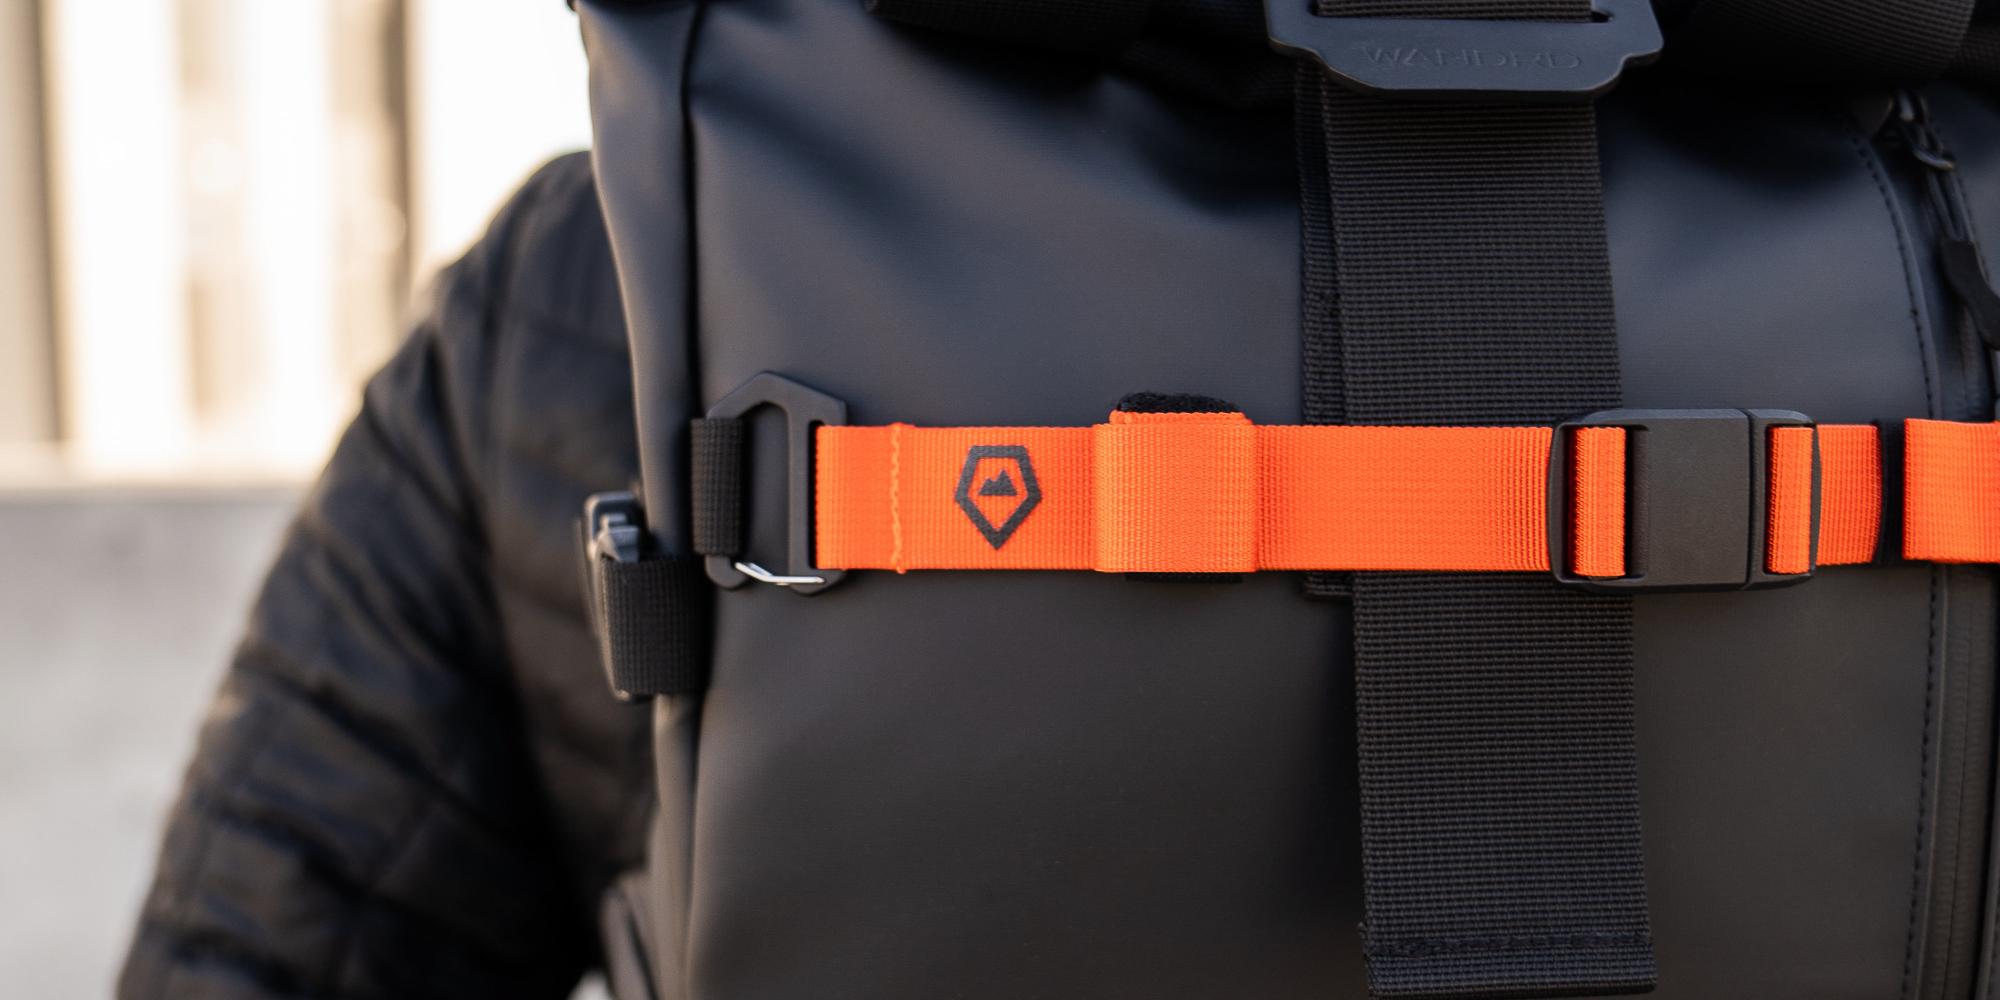 Wandrd All-new Prvke 31 Backpack - Backpack alone is not enough!